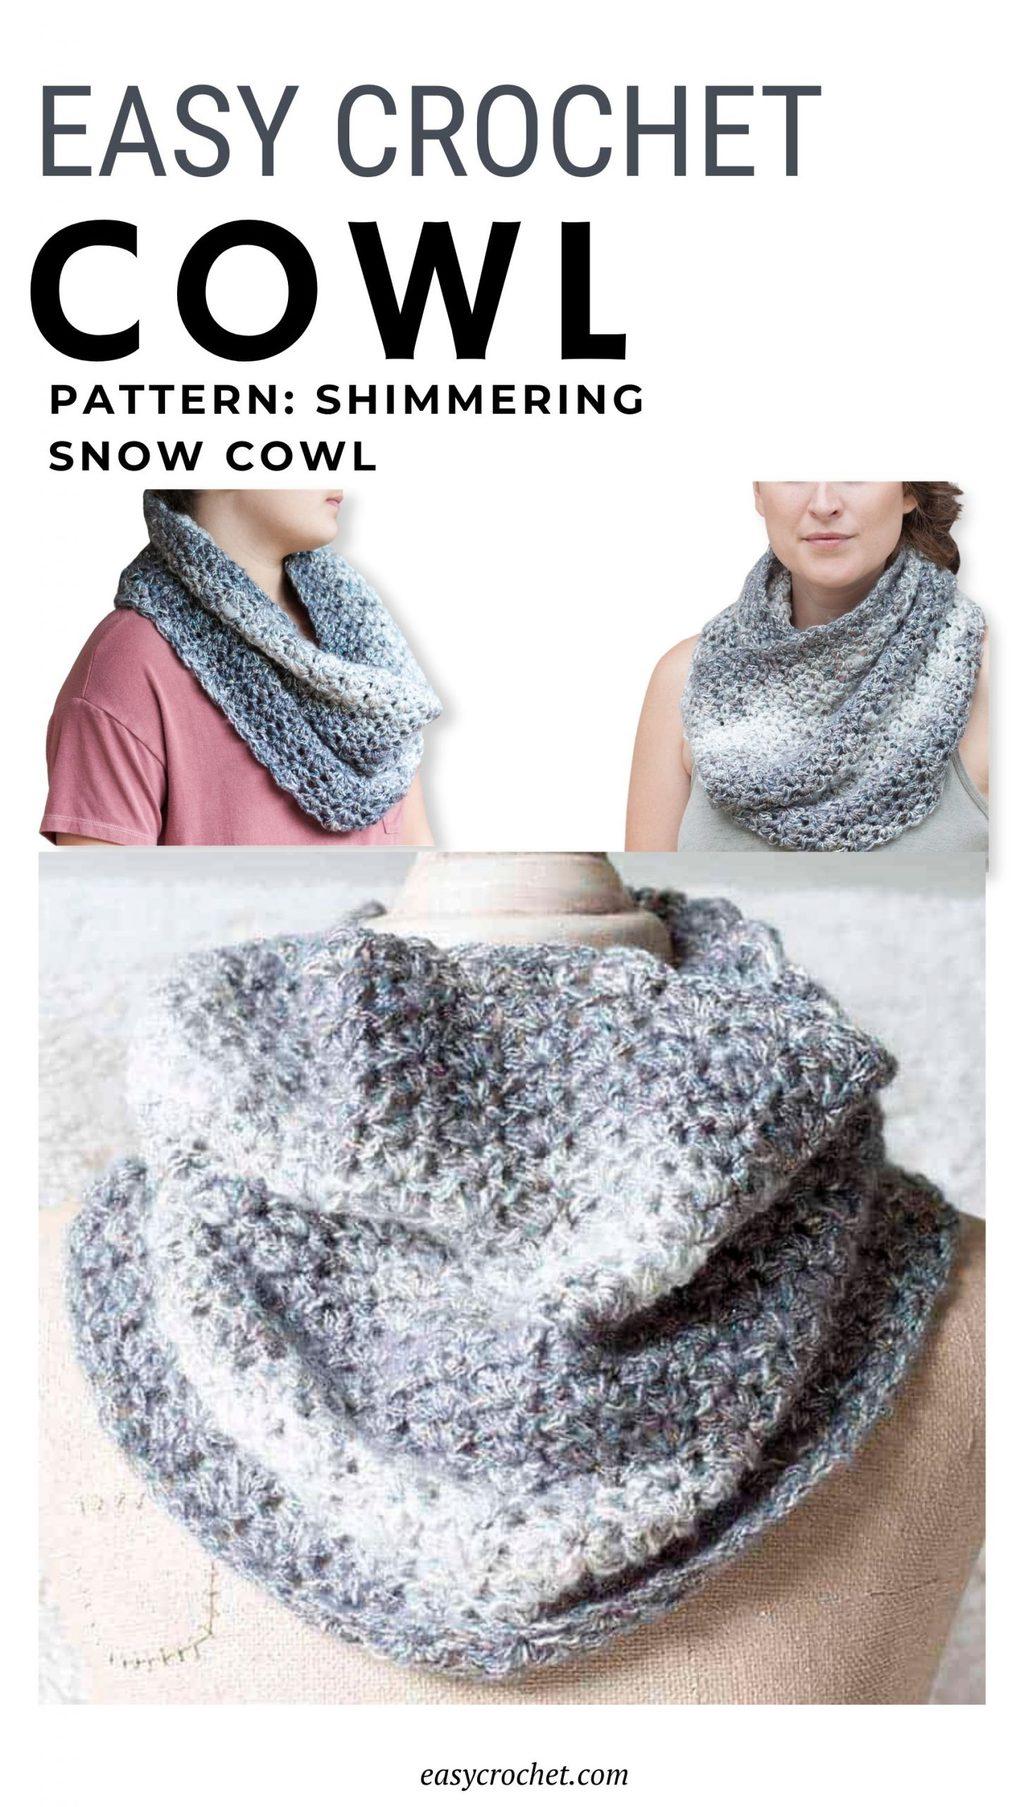 sparkly yarn crochet cowl pattern